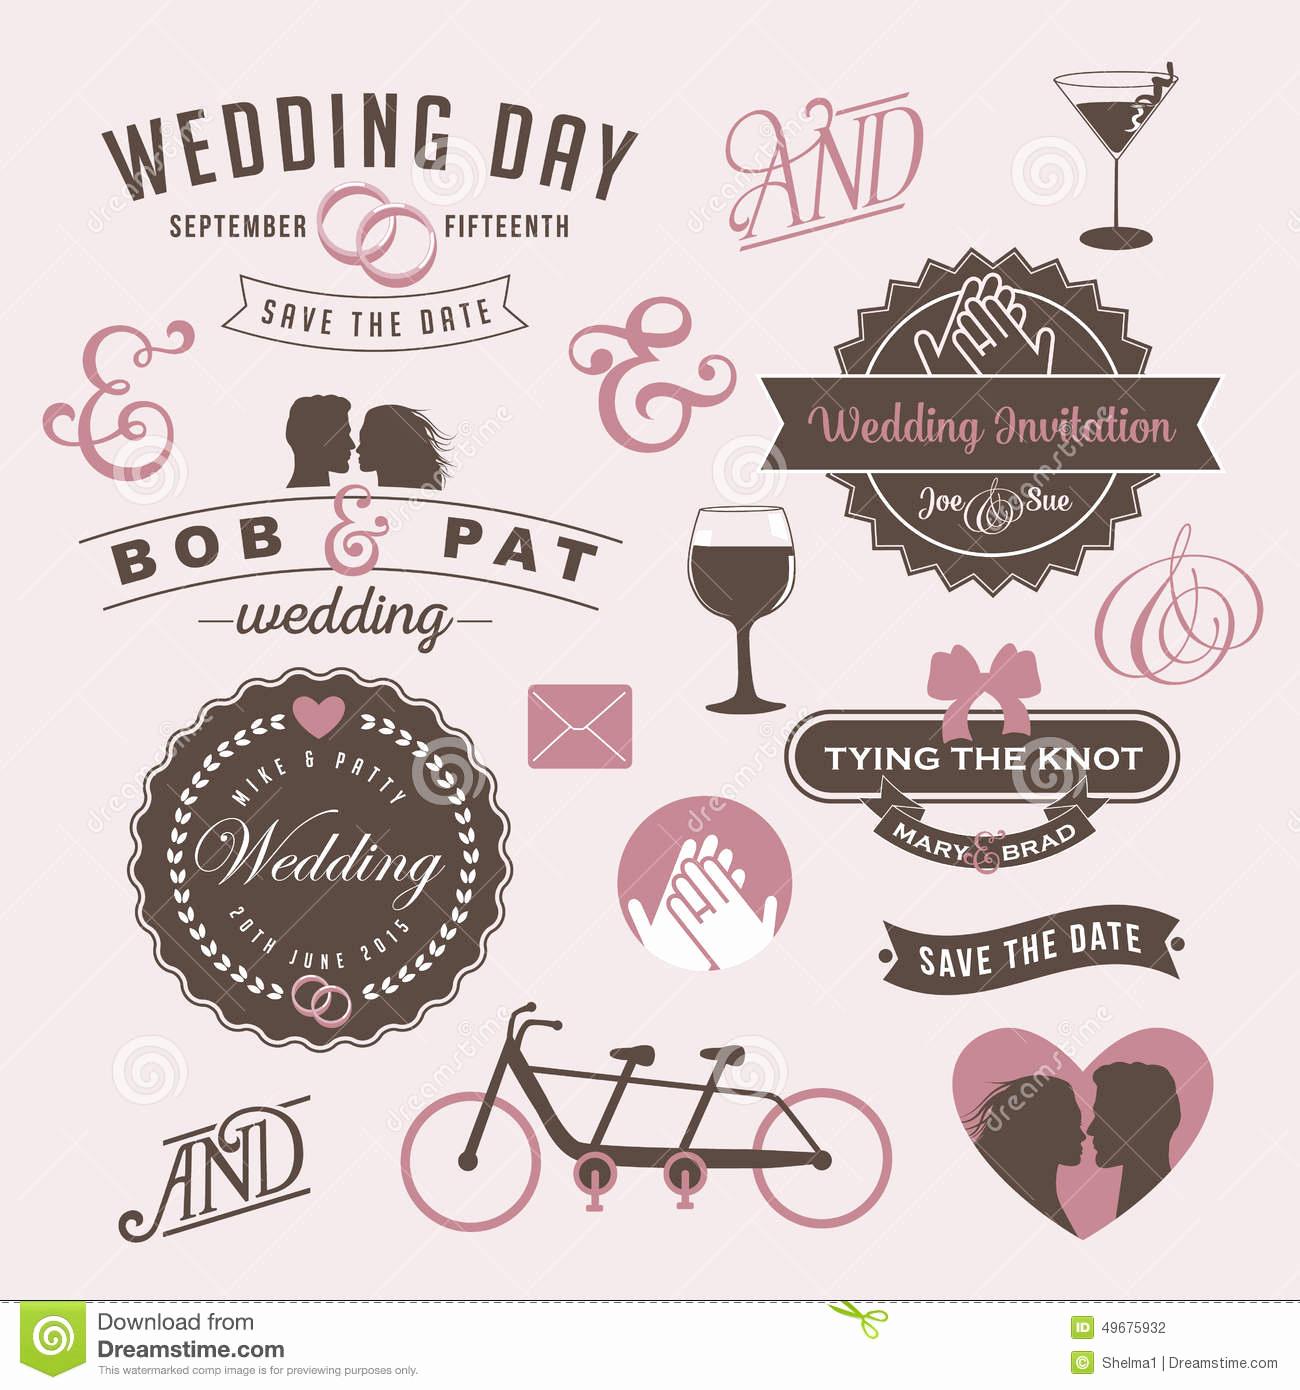 Wedding Invitation Graphic Design Luxury Vintage Wedding Invitation Design Graphic Elements Stock